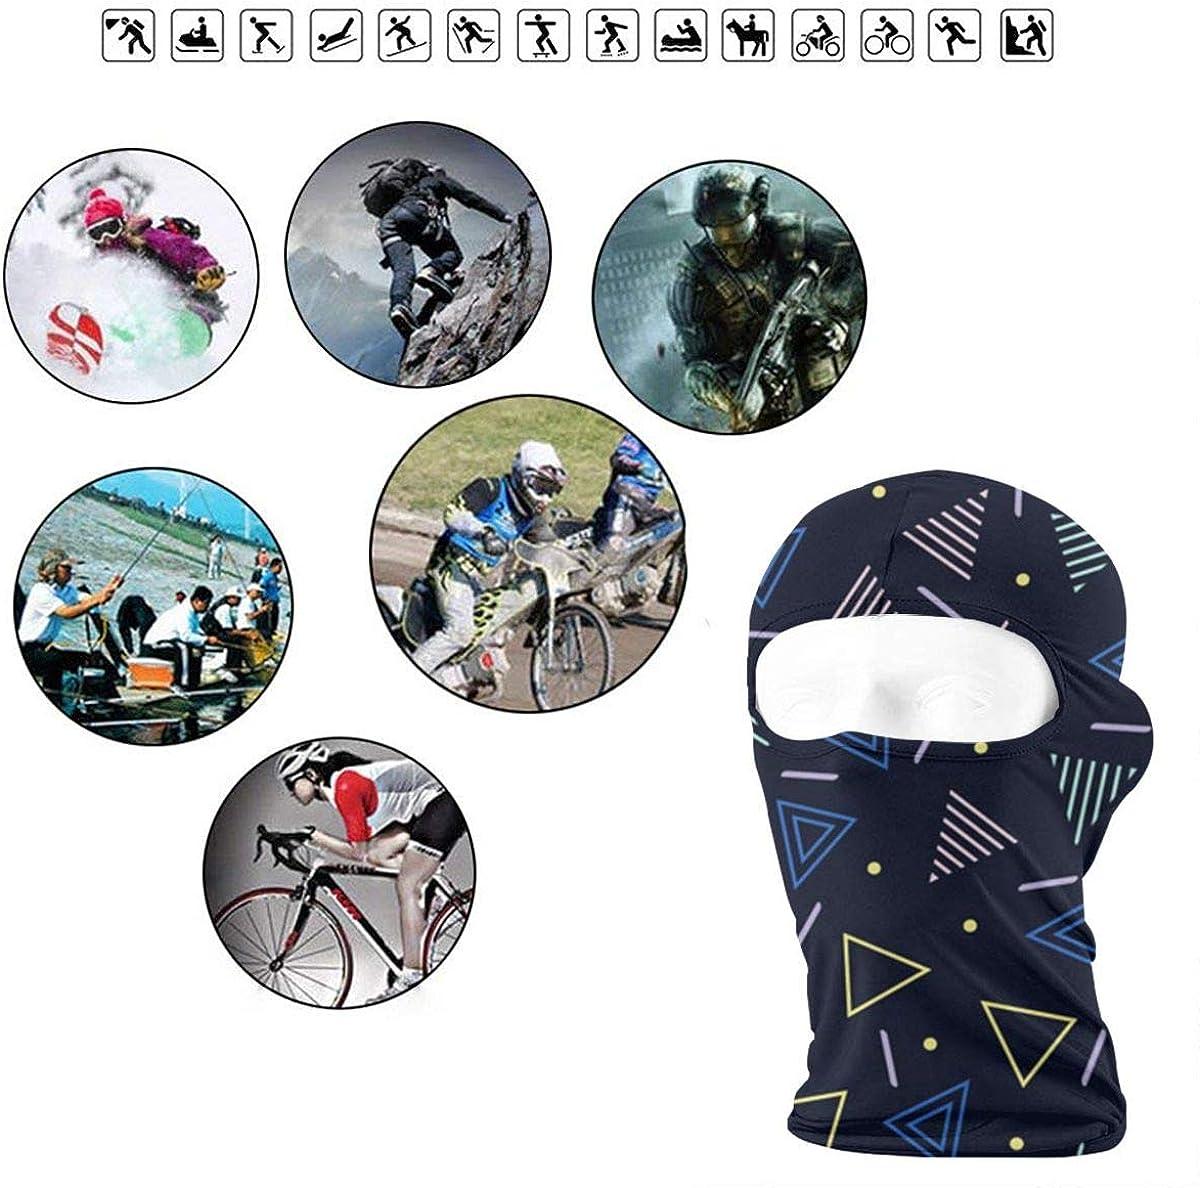 CAClifestyle Abstract Geometric Patterns Unisex Windproof Balaclavas Full Face Mask Hood